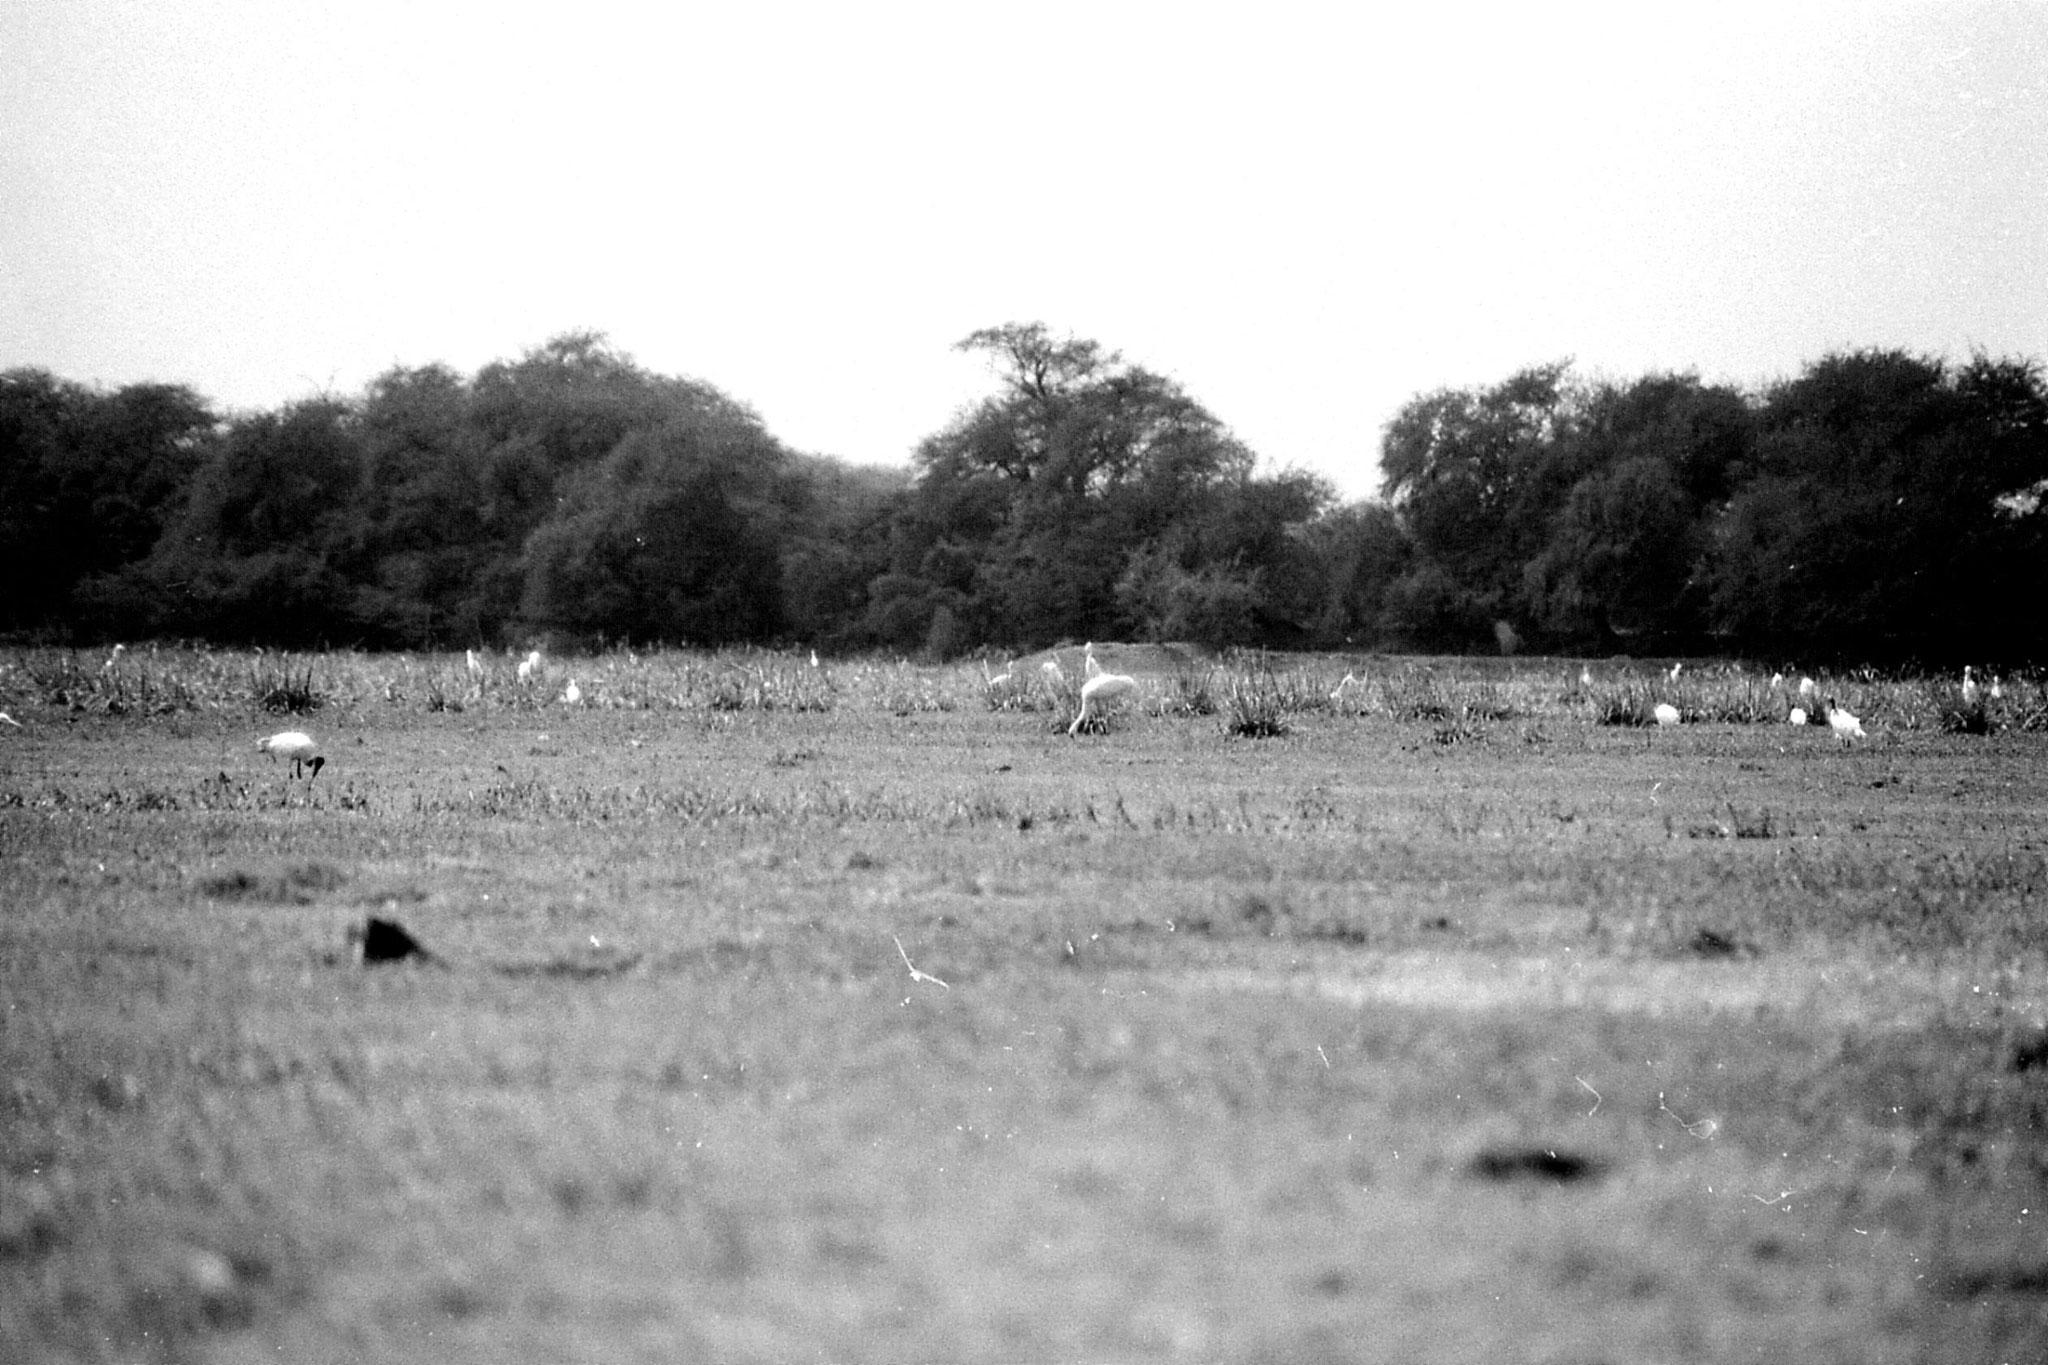 1/4/1990: 13: Bharatpur cranes including Siberian